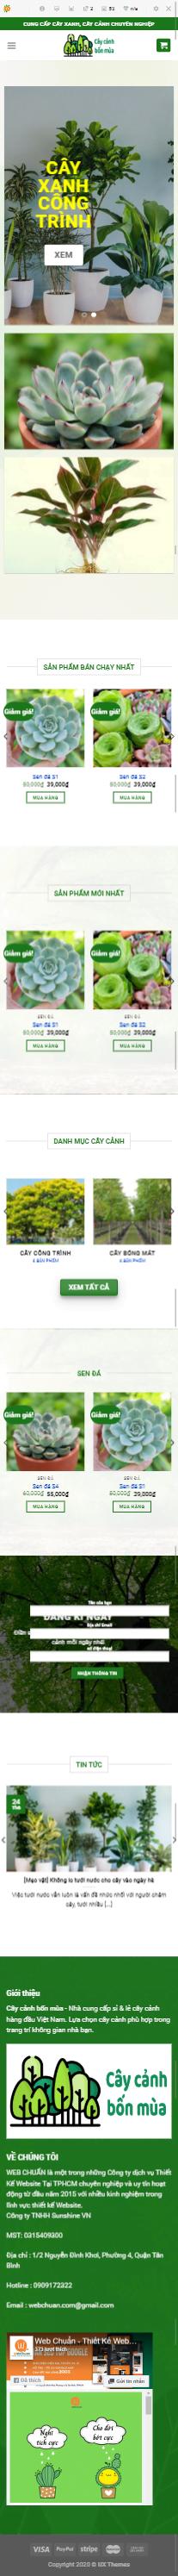 screencapture-banhangfs14-webchuan-2020-06-30-15_01_05